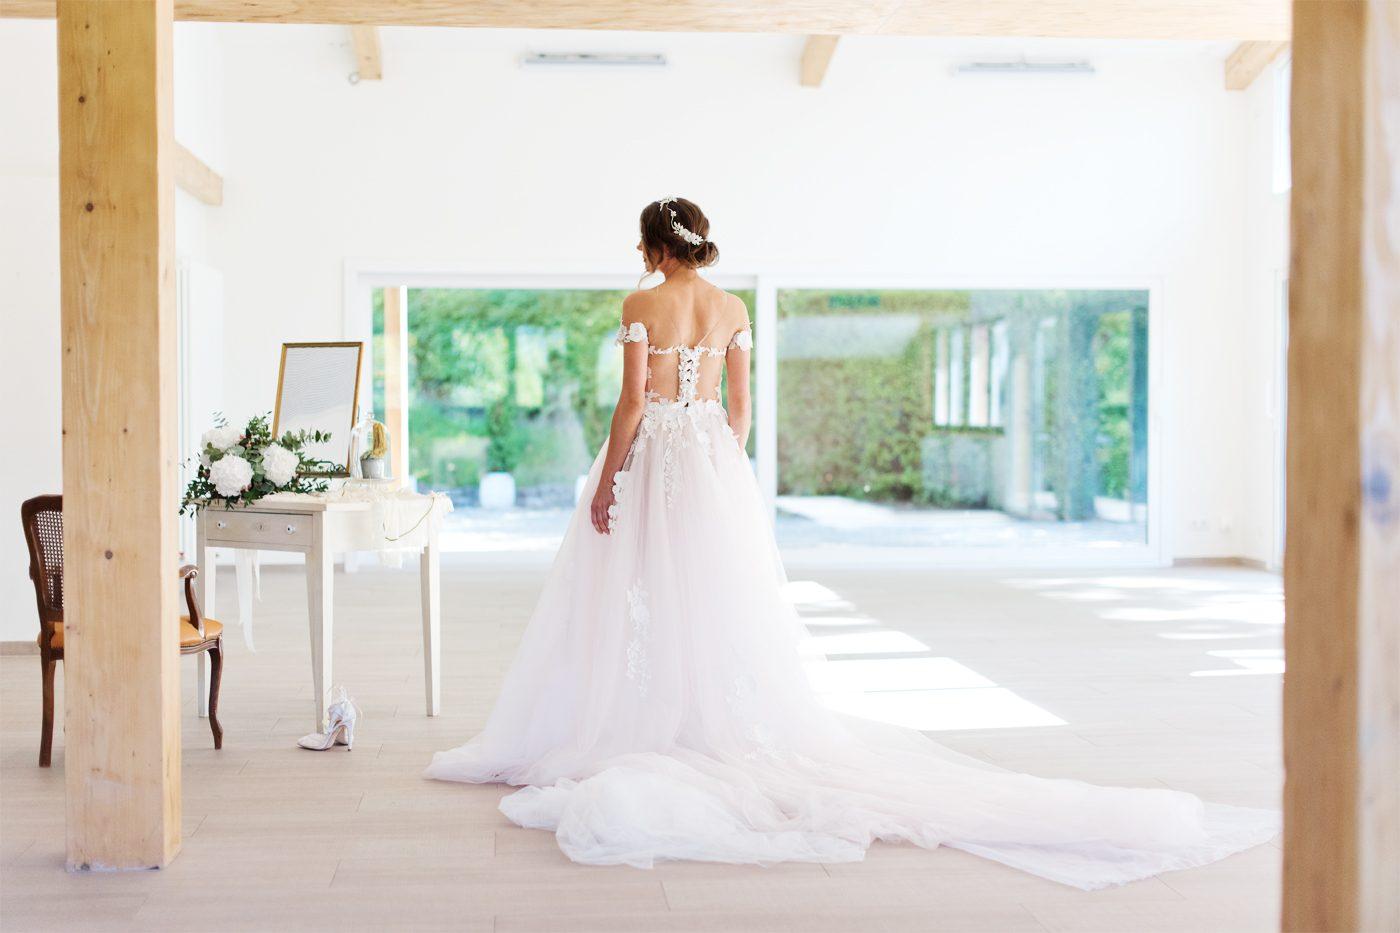 Outfit: Bridal Styled Shoot with Galia Lahav Dress